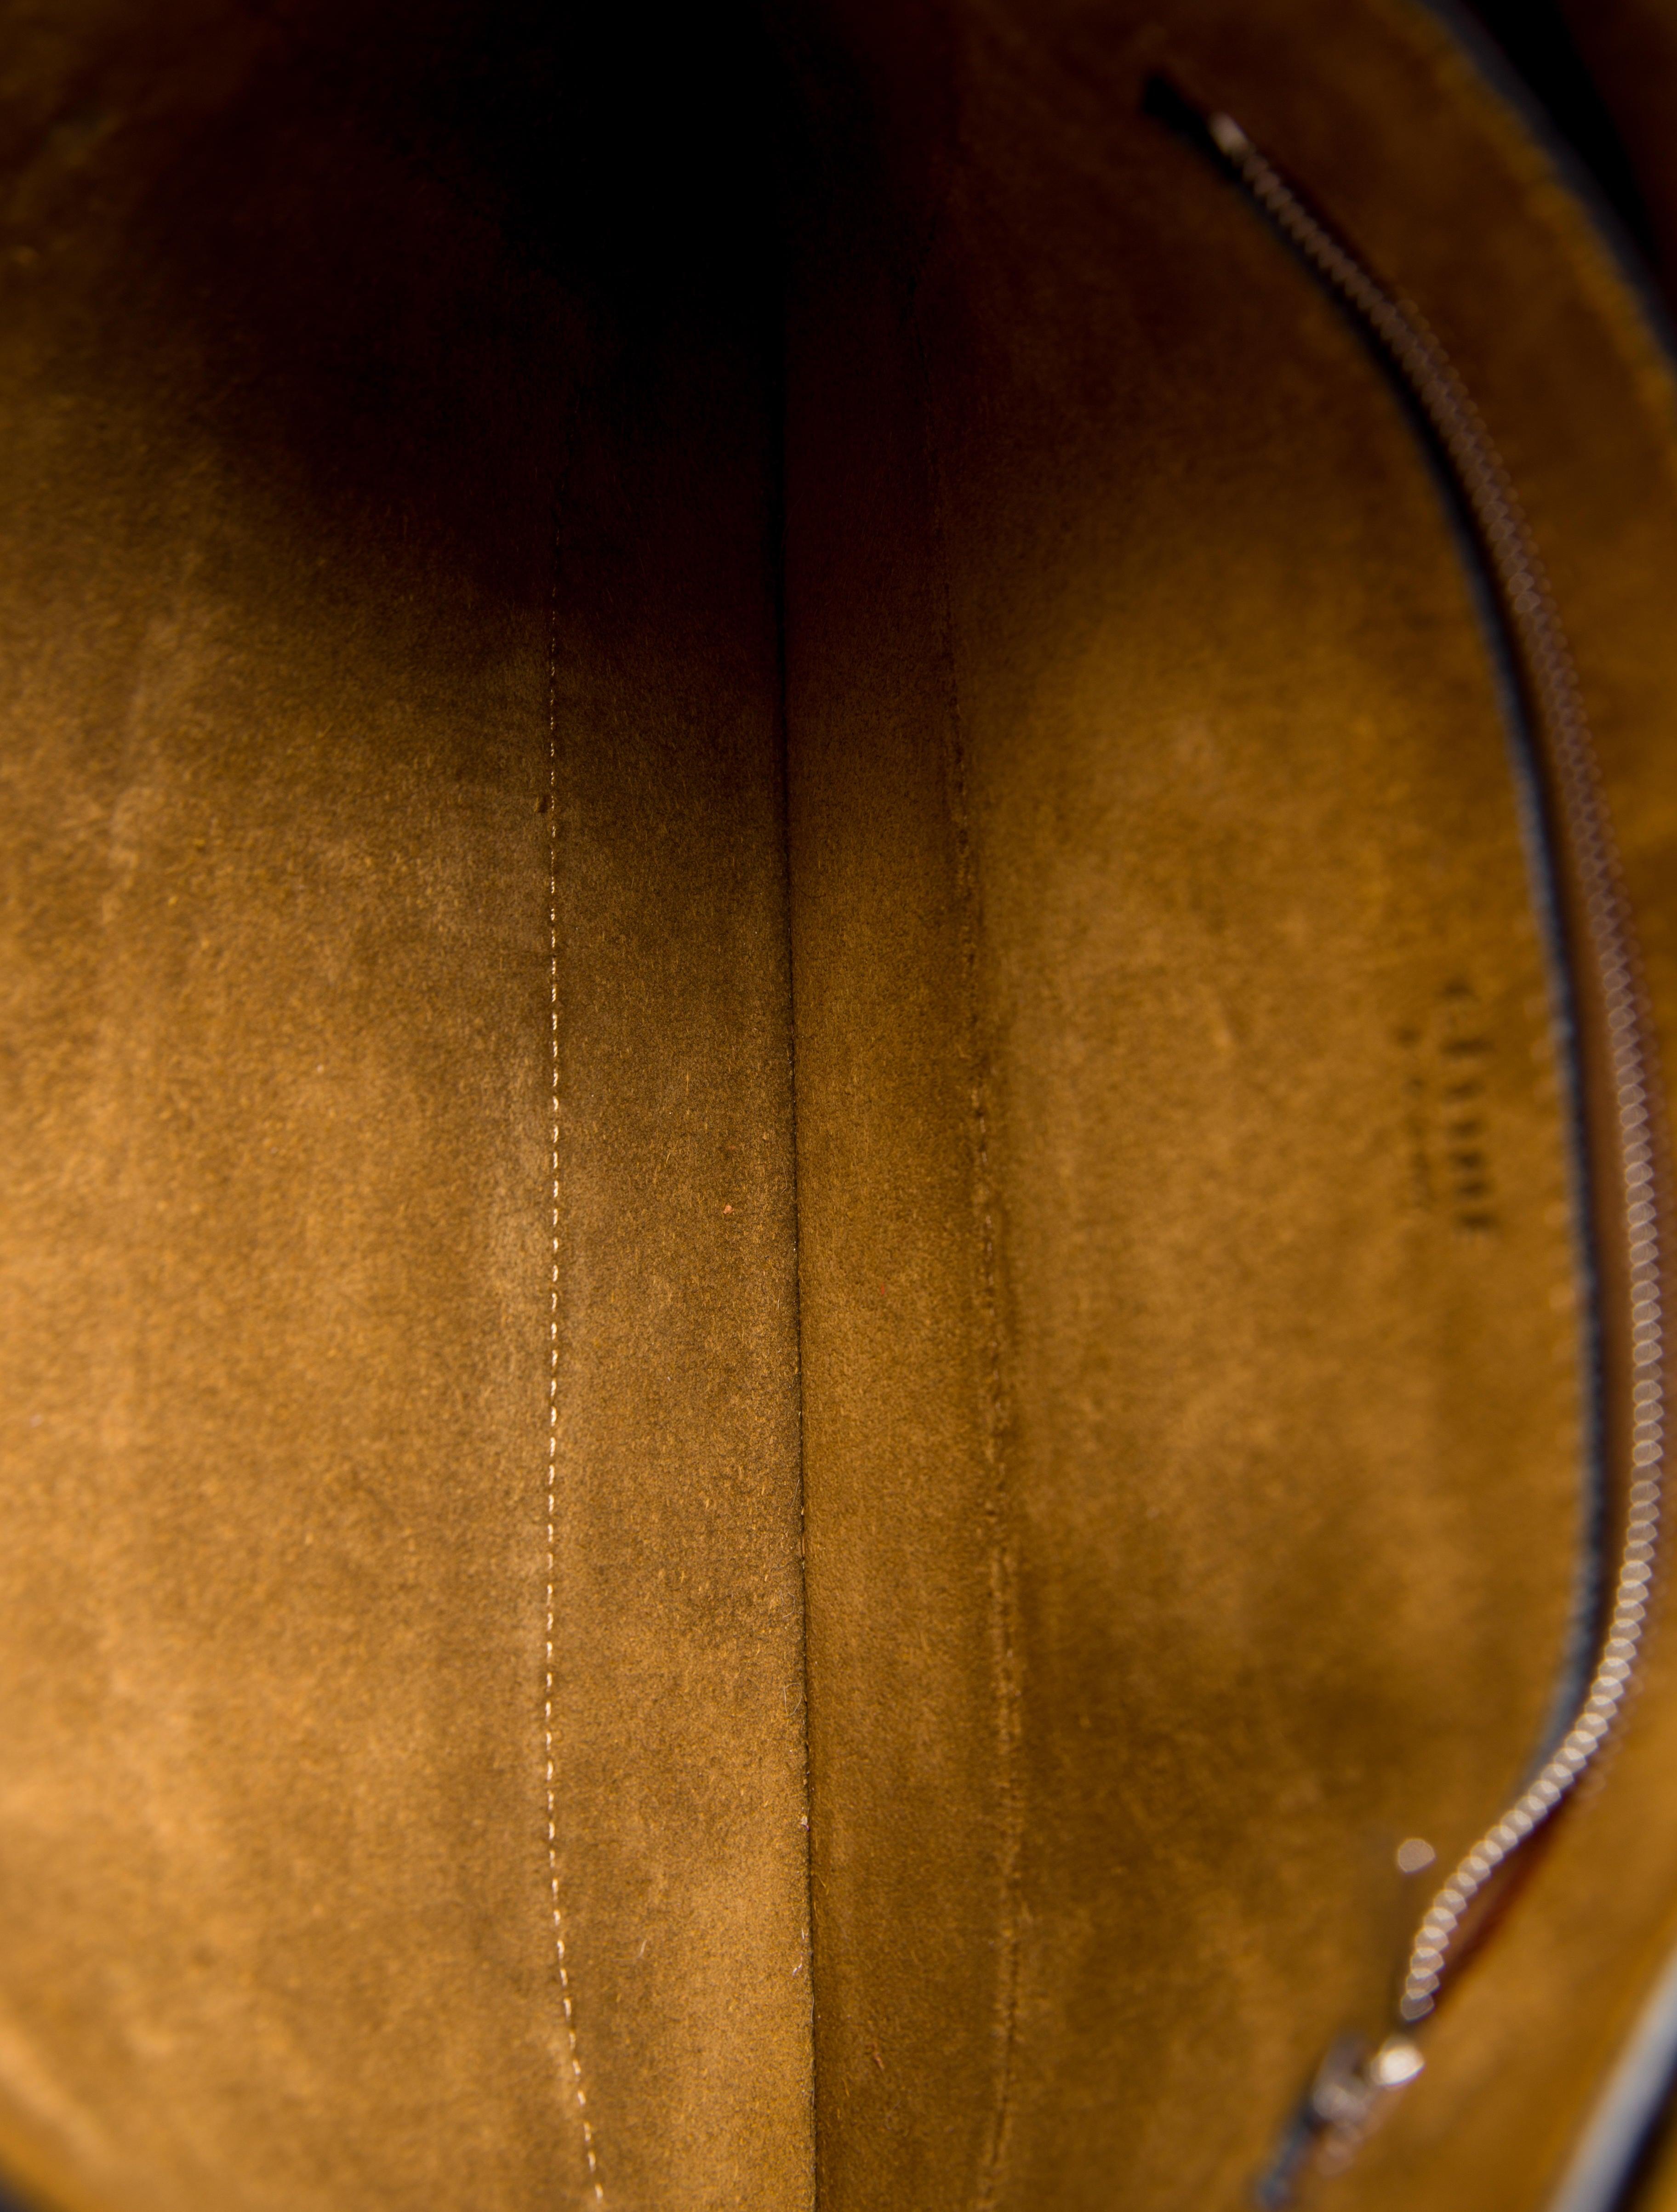 replica celine - celine diamond shoulder bag w tags, celine classic box bag price